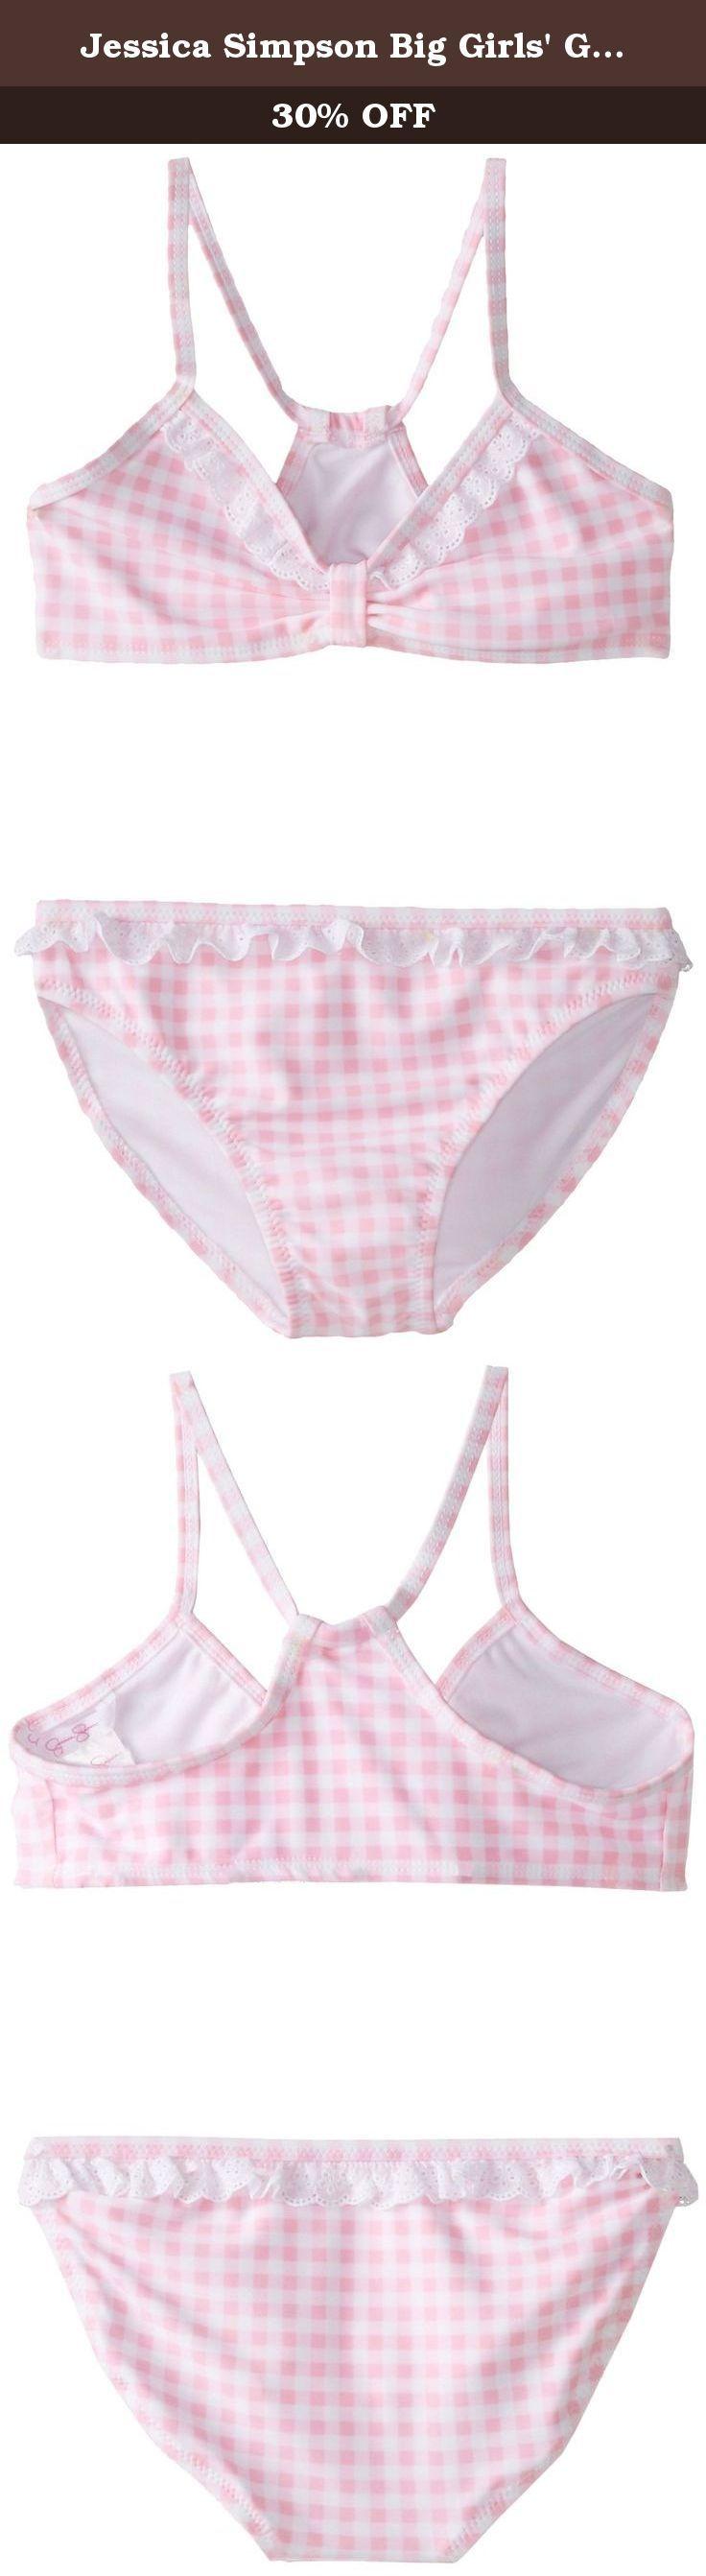 Jessica Simpson Big Girls' Gingham Bikini, Pink, 8. Girls swimwear.